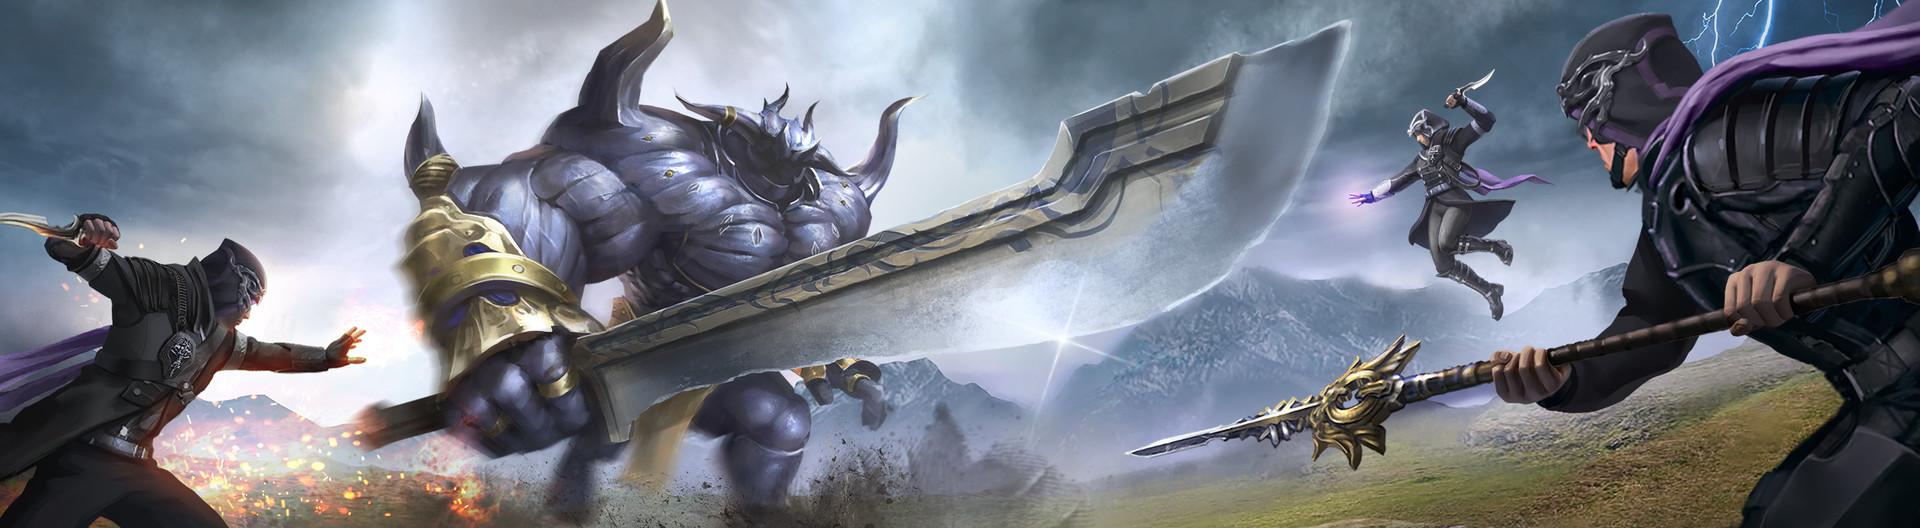 artstation final fantasy iron